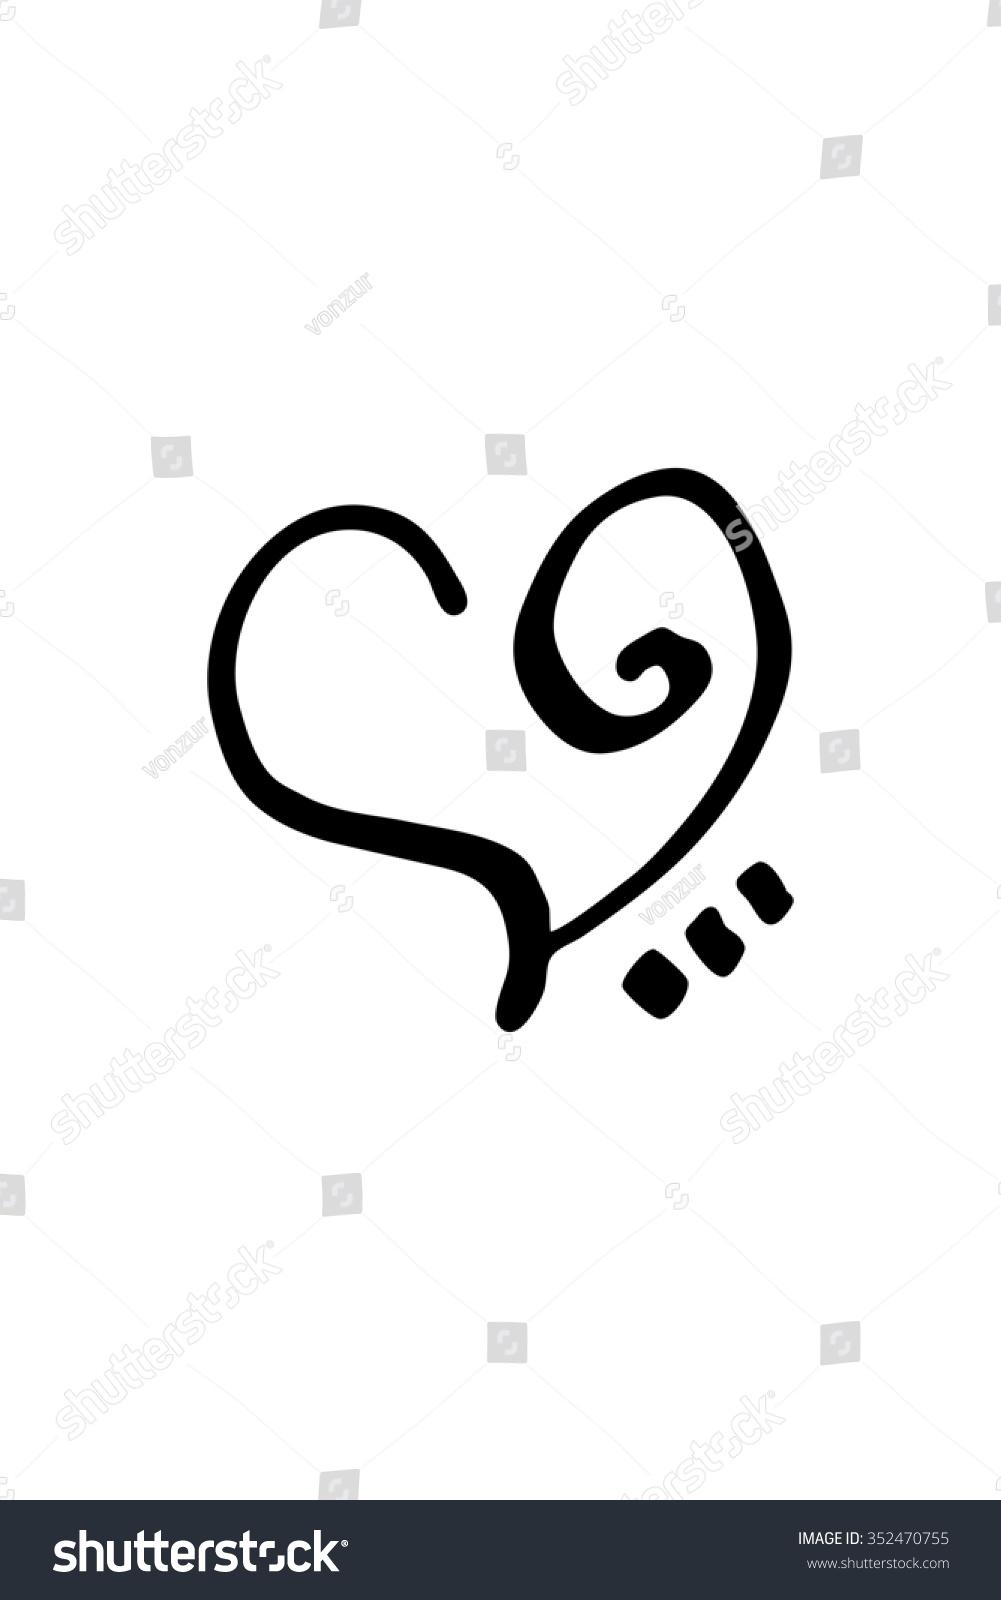 Zibu Angelic Symbols Used Connect Love Stock Photo Photo Vector